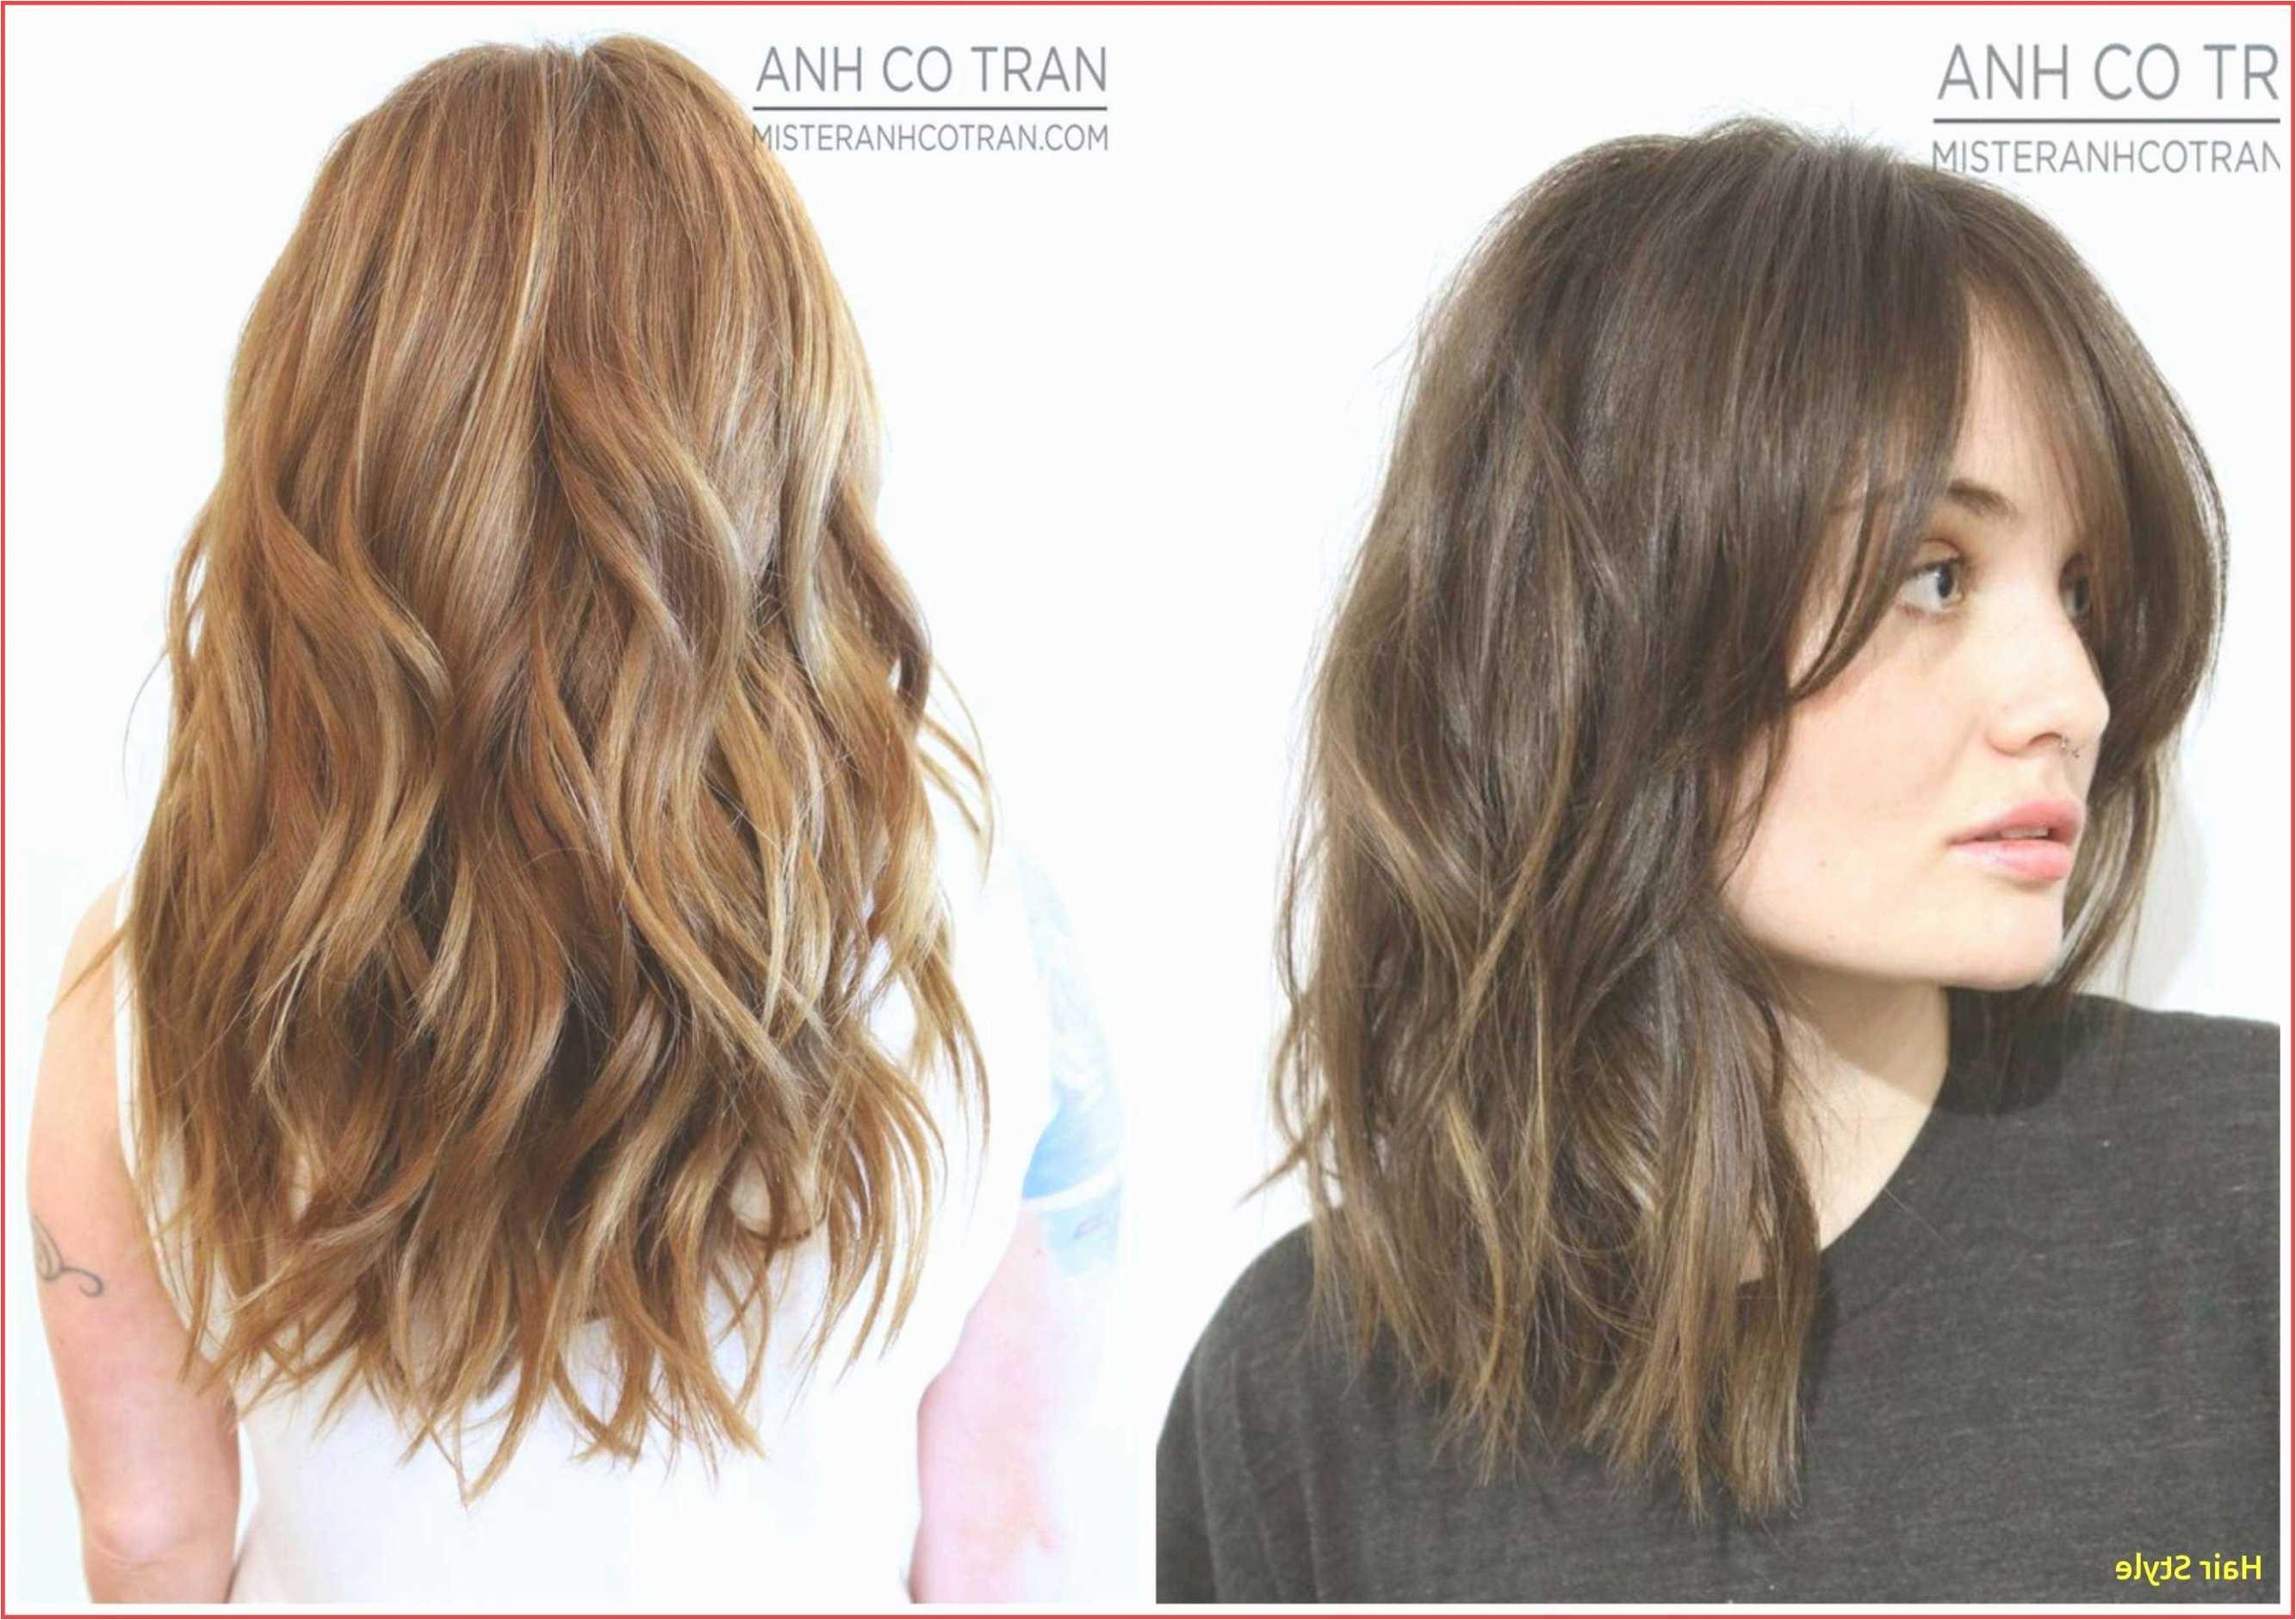 Asian Girl Hair Cut Unique Beautiful Short Hairstyles for Wavy asian Hair Asian Girl Hair